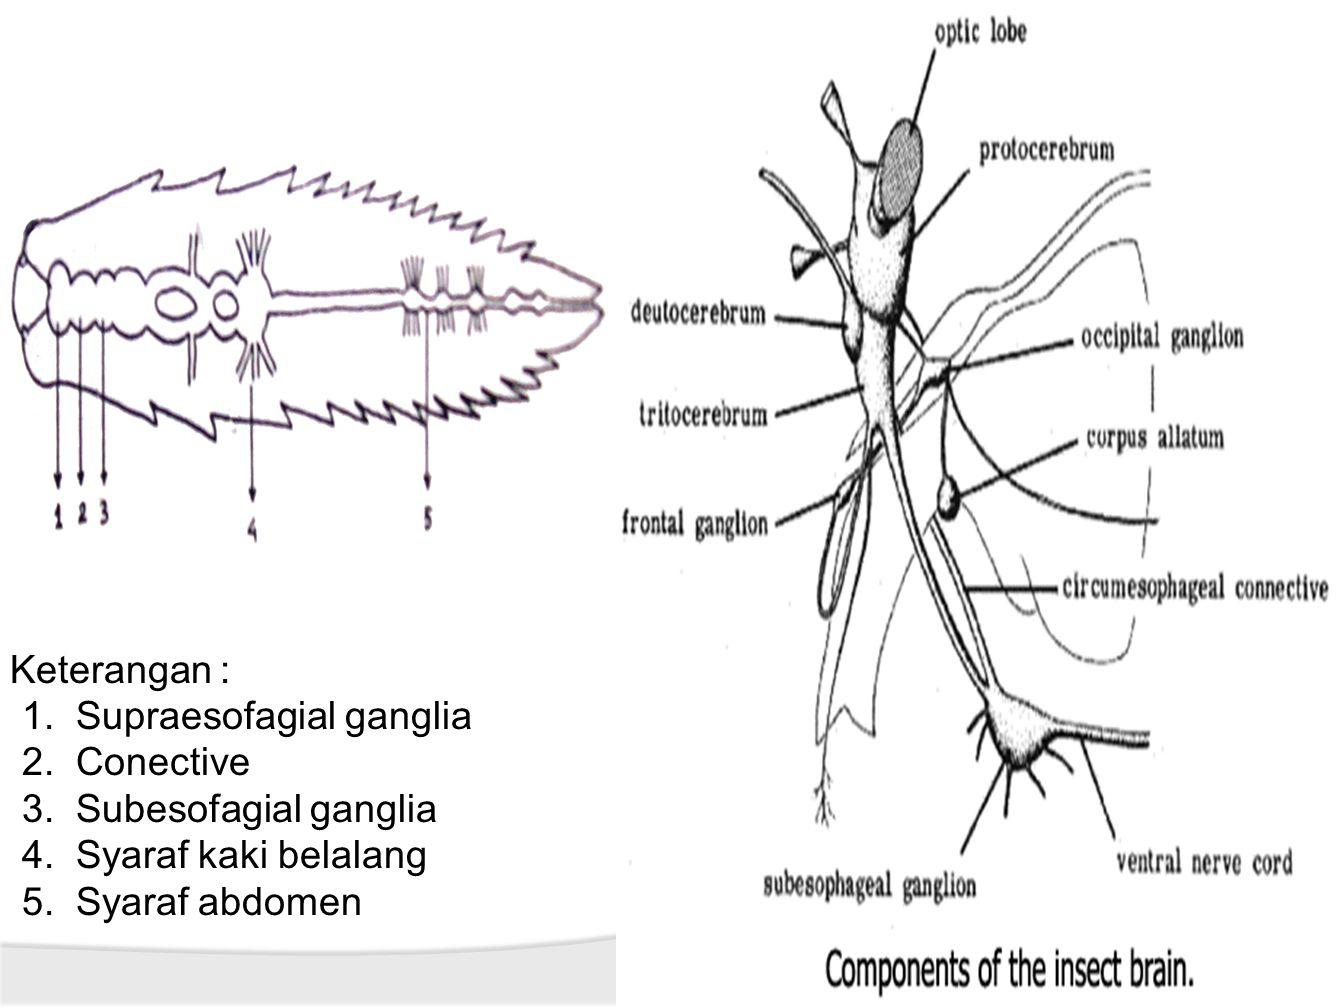 Keterangan : 1.Supraesofagial ganglia 2.Conective 3.Subesofagial ganglia 4.Syaraf kaki belalang 5.Syaraf abdomen